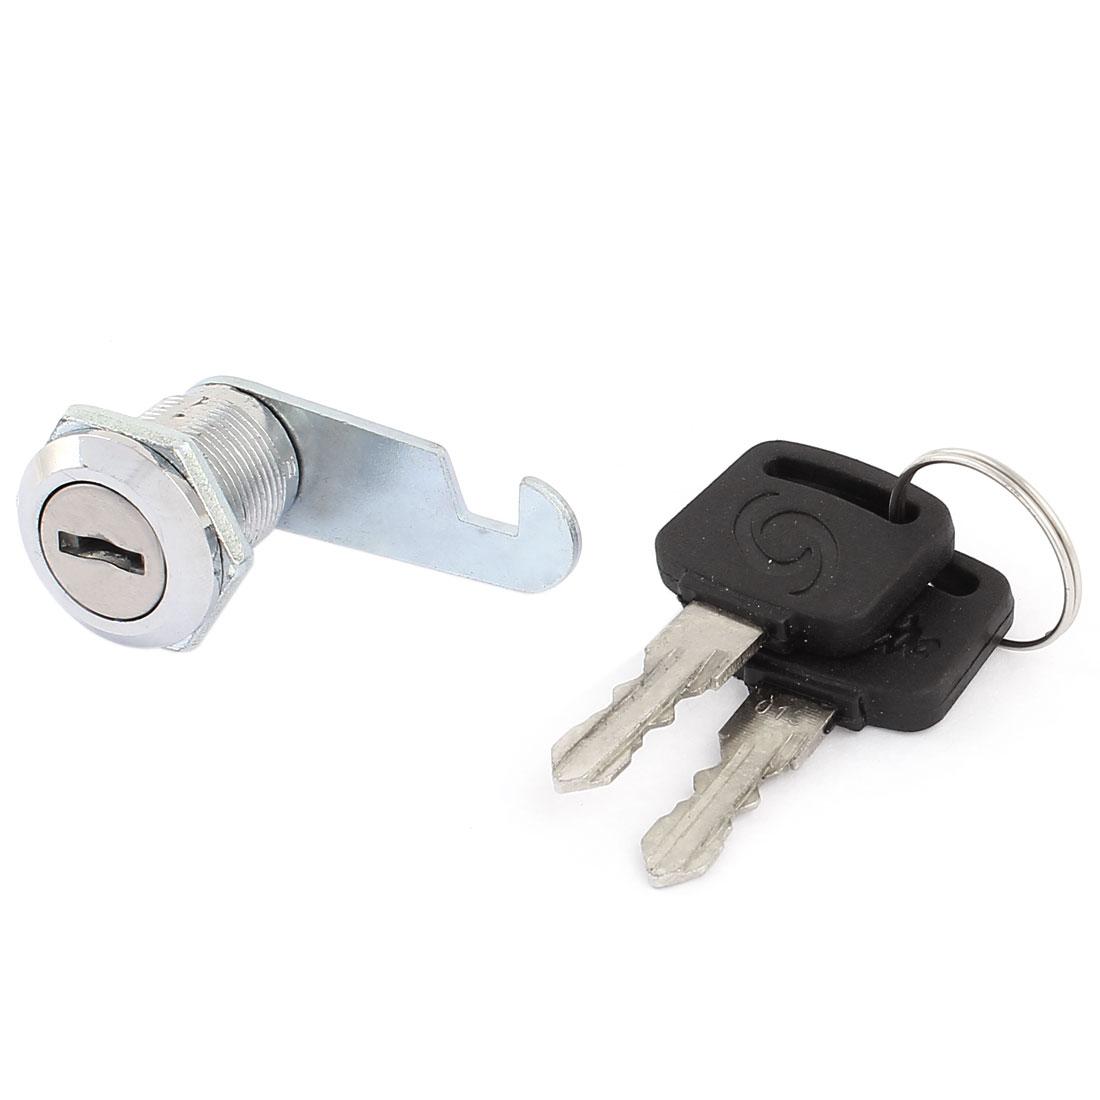 "Mailbox Cabinet 7.9"" Round Head Dia Cylinder Style Cam Lock 2 Keys"